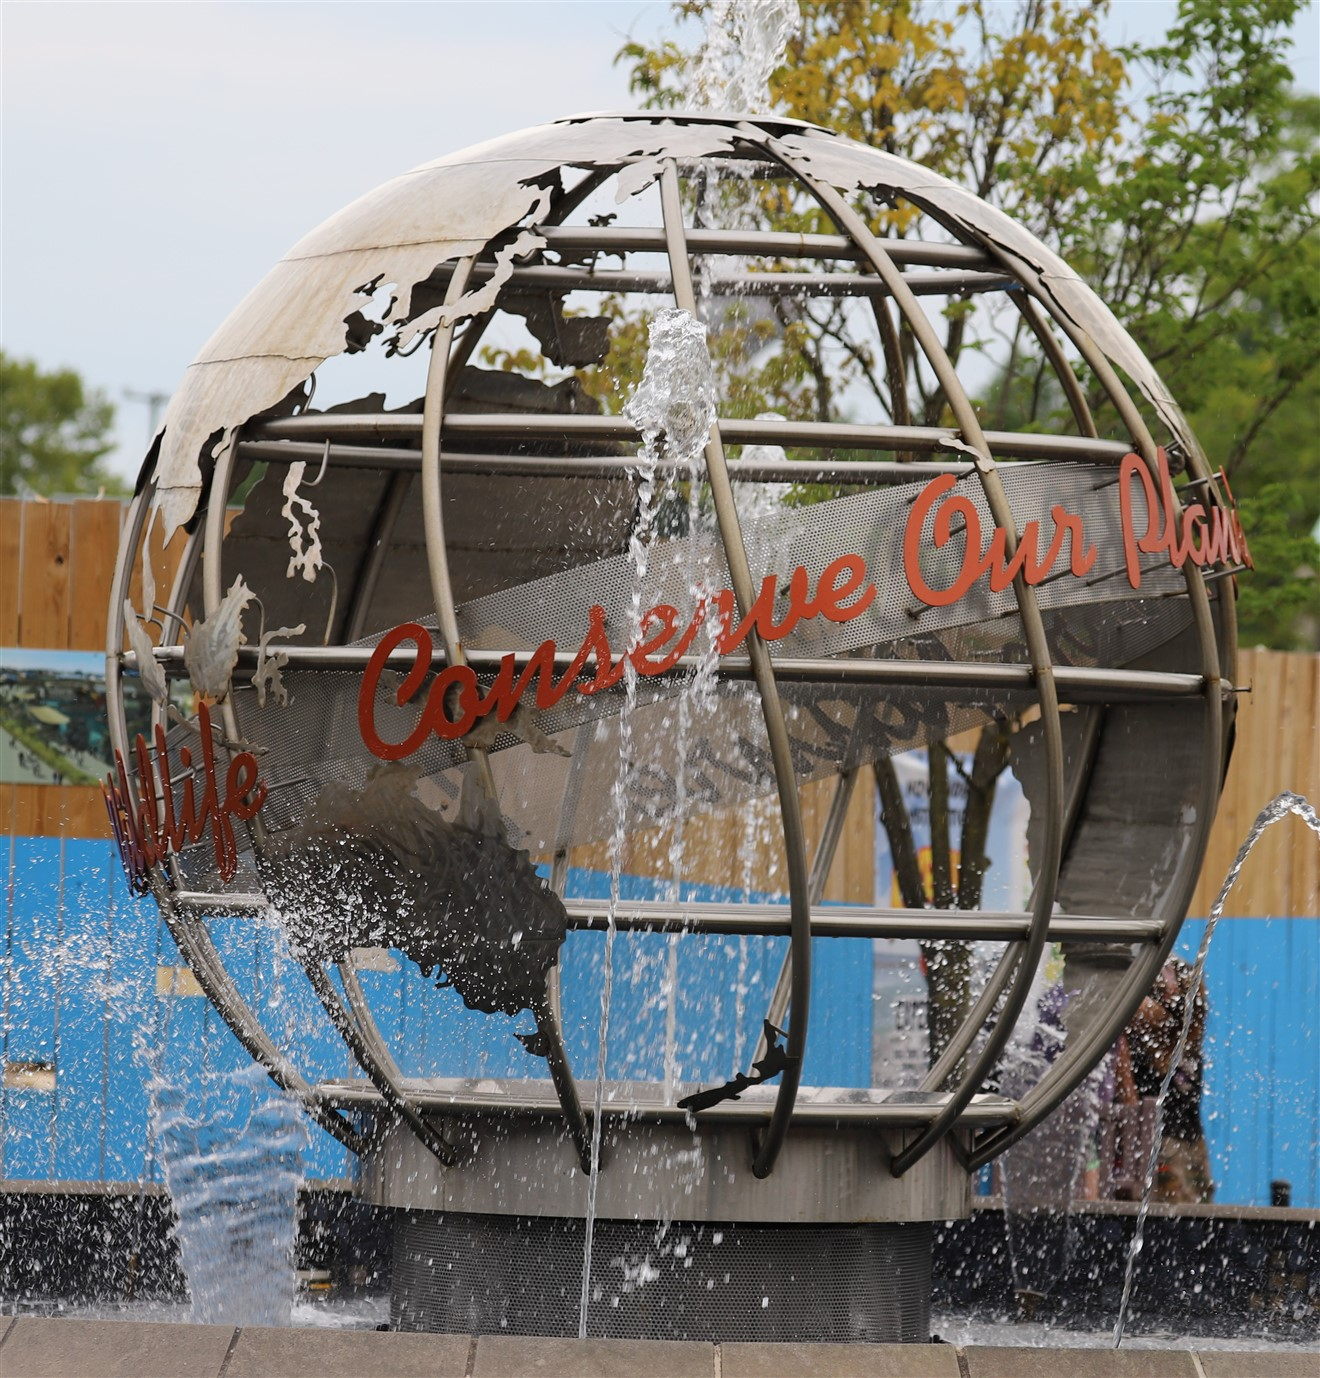 2018 07 29 154 Columbus Zoo.jpg